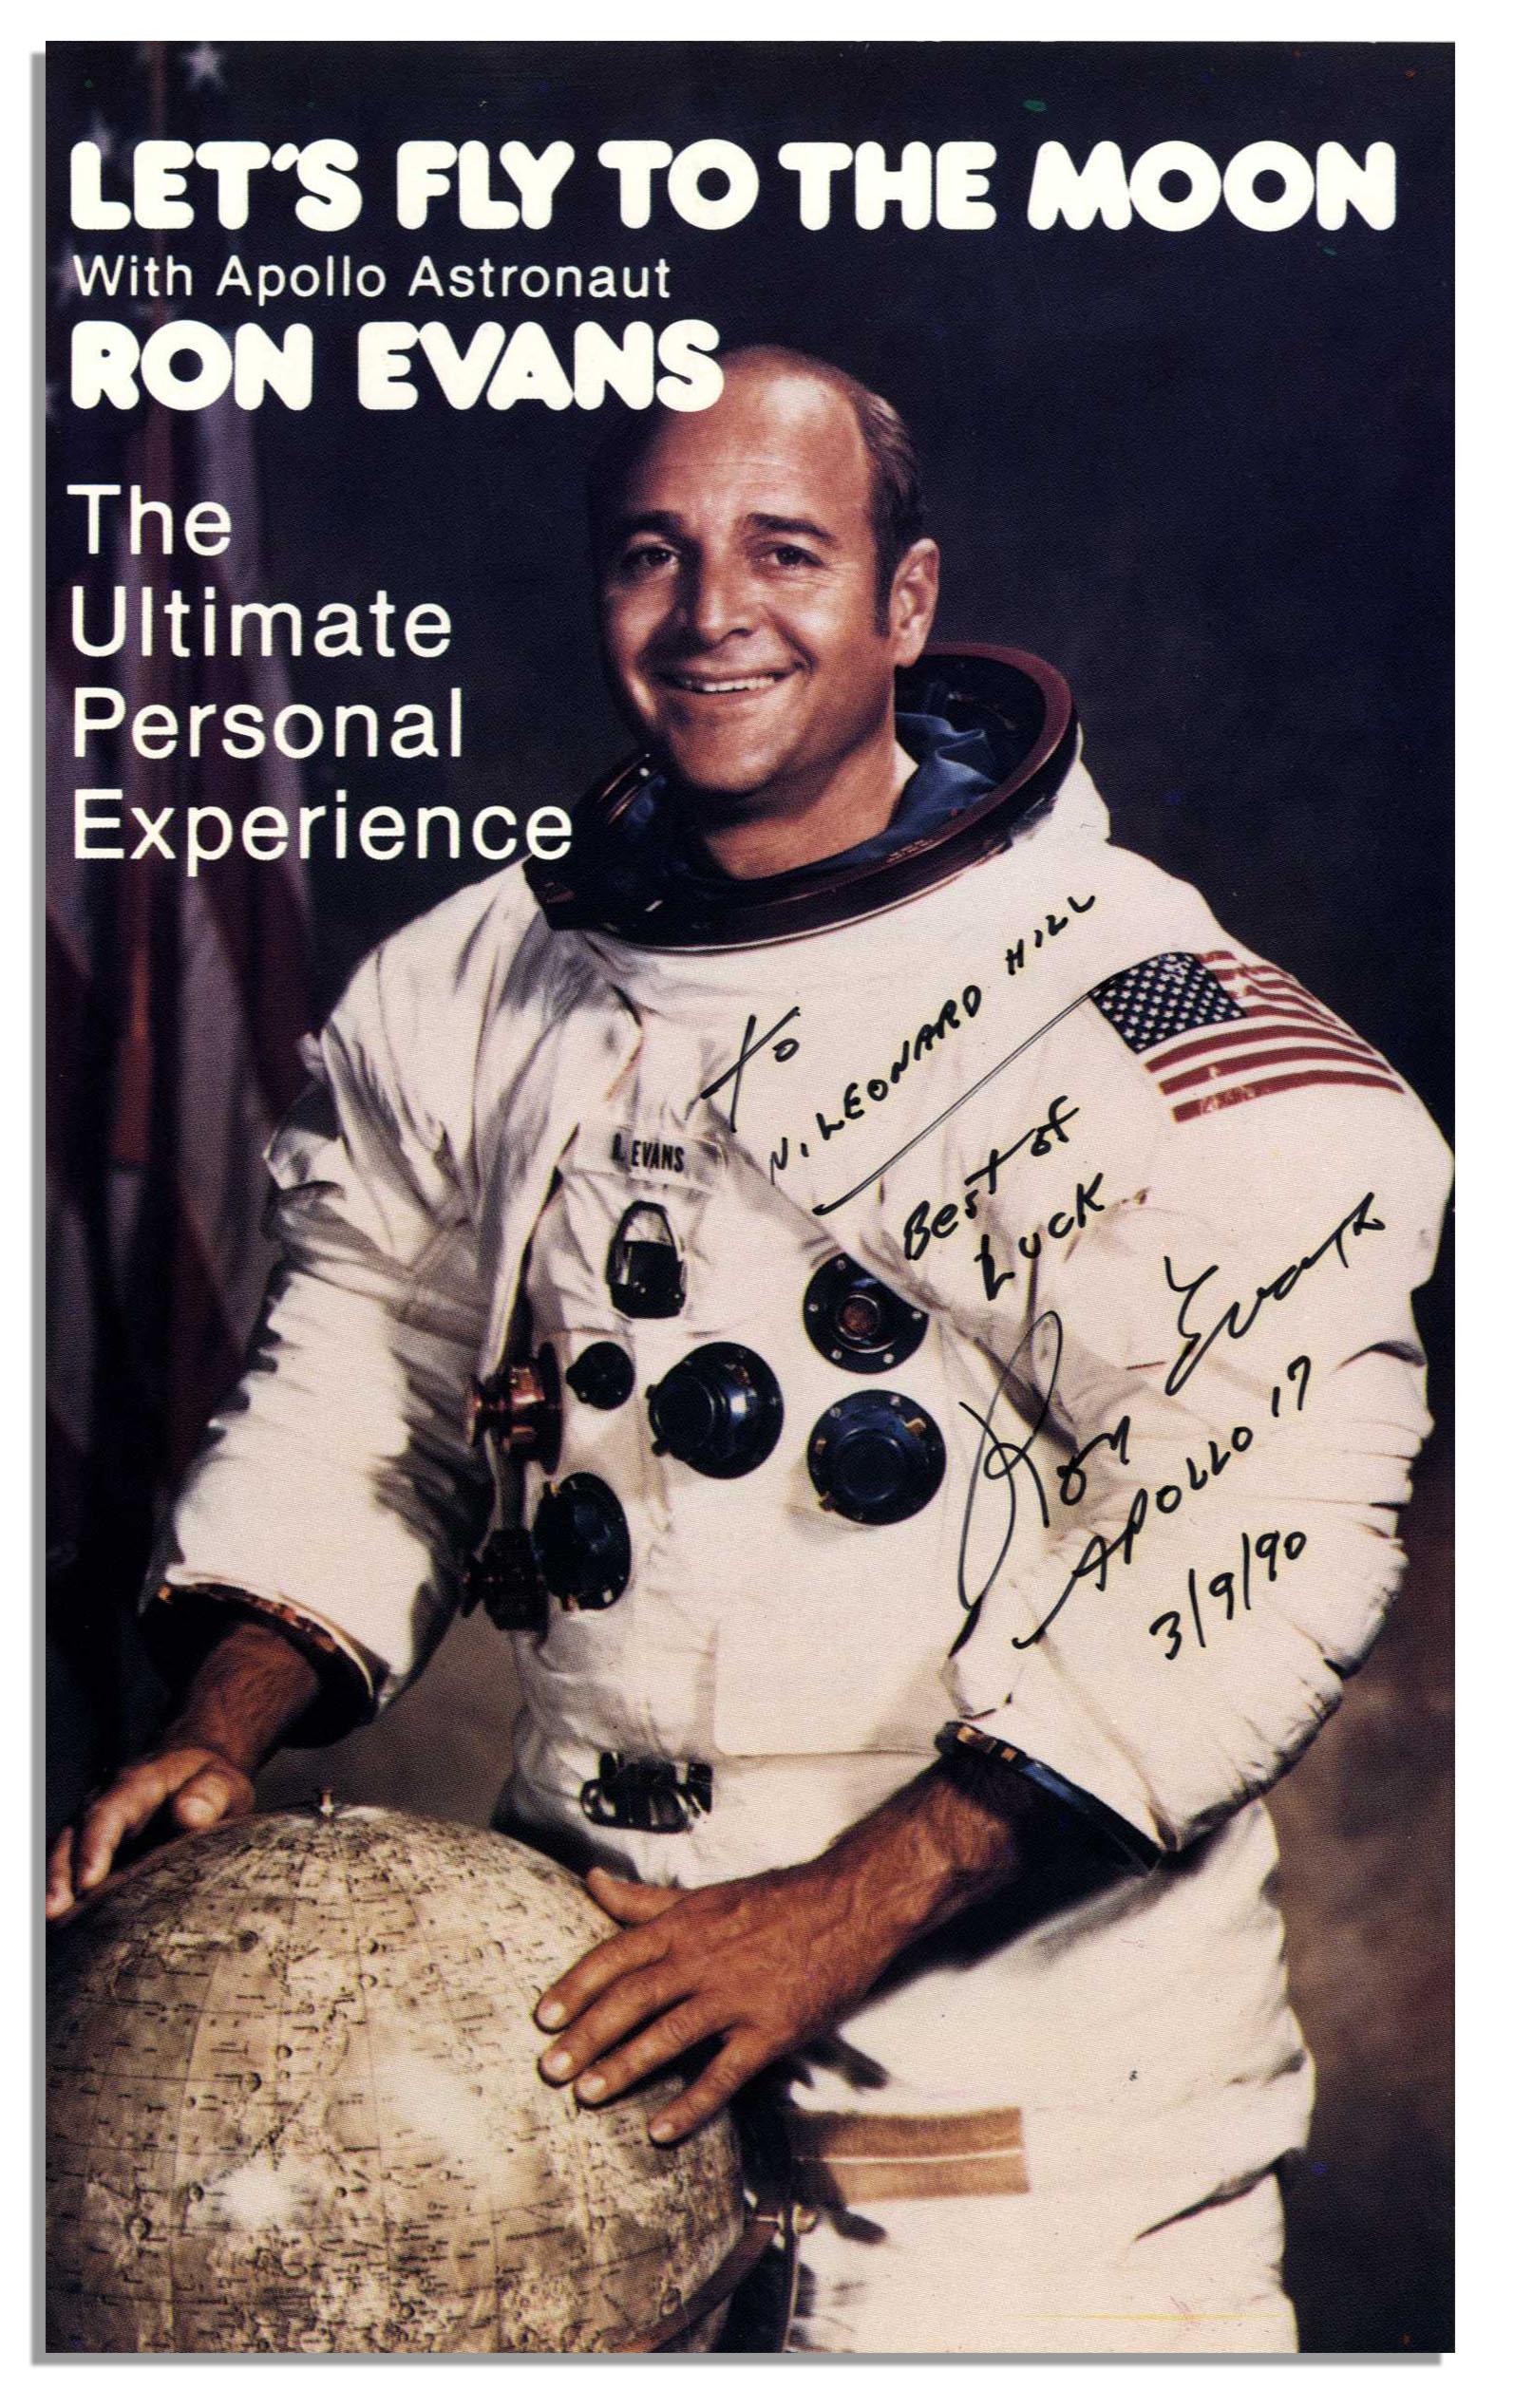 ronald evans astronaut - photo #10